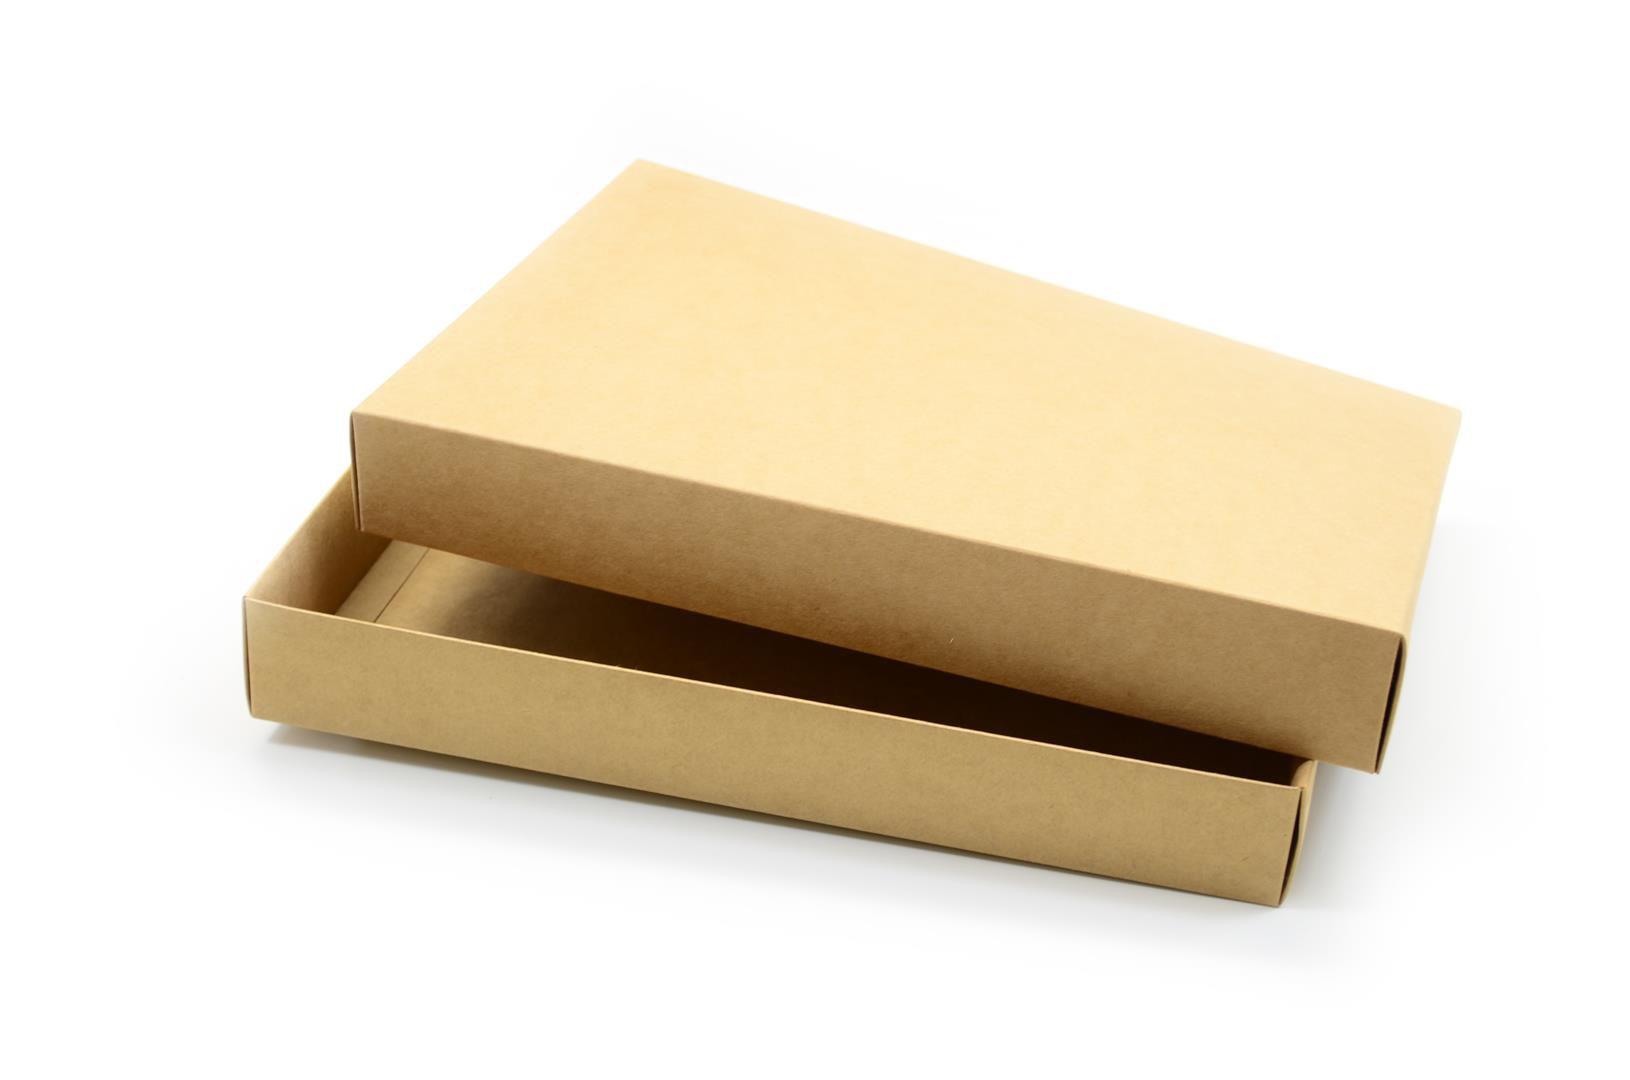 Ref 039 Kraft - Caixa c/ tampa papel - 36x25,5x5 cm - c/ 10 unidades